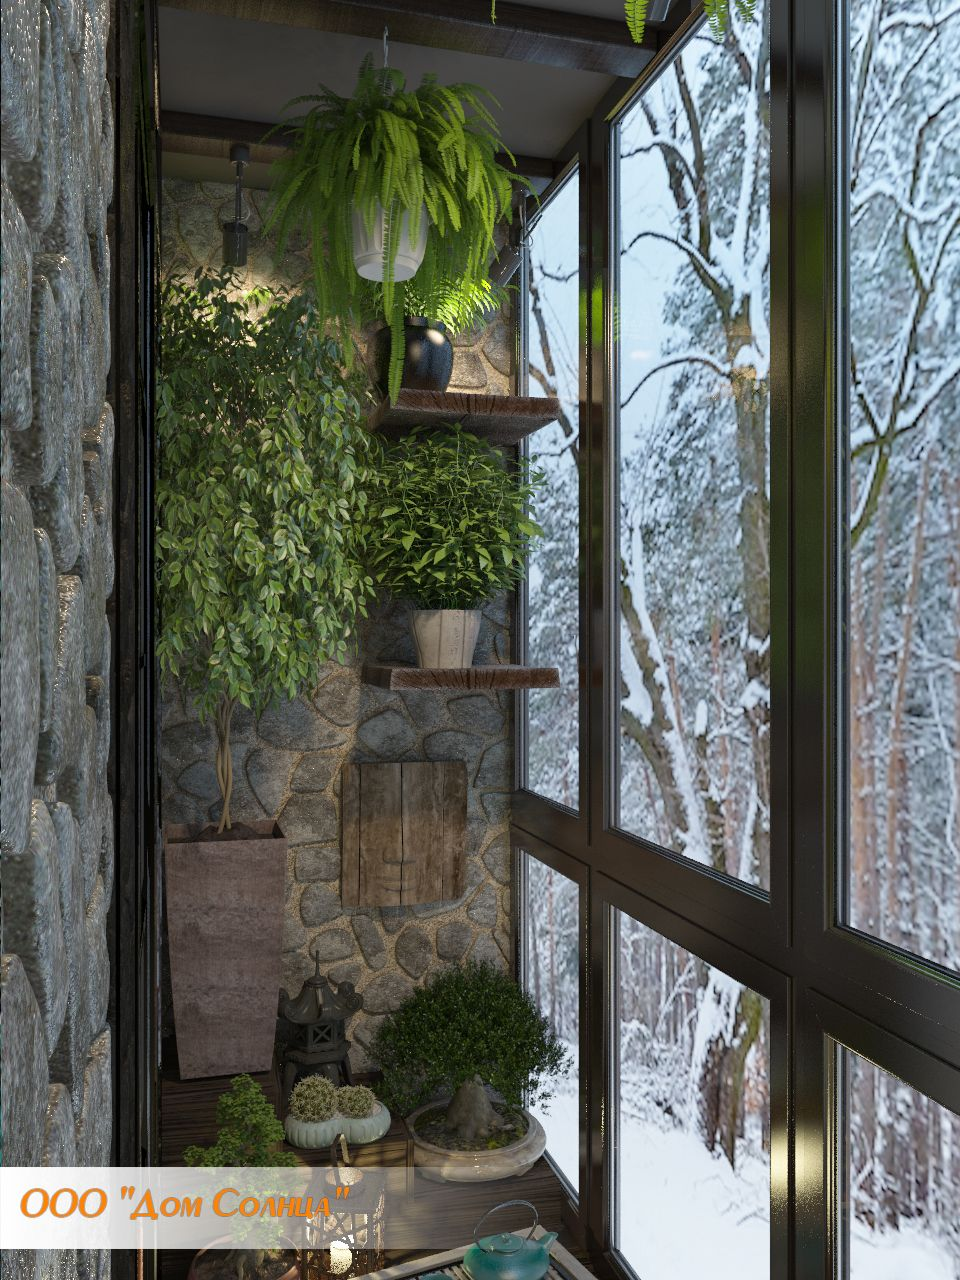 премиум-версия предоставит зимний сад на балконе своими руками фото слов очевидцев казни